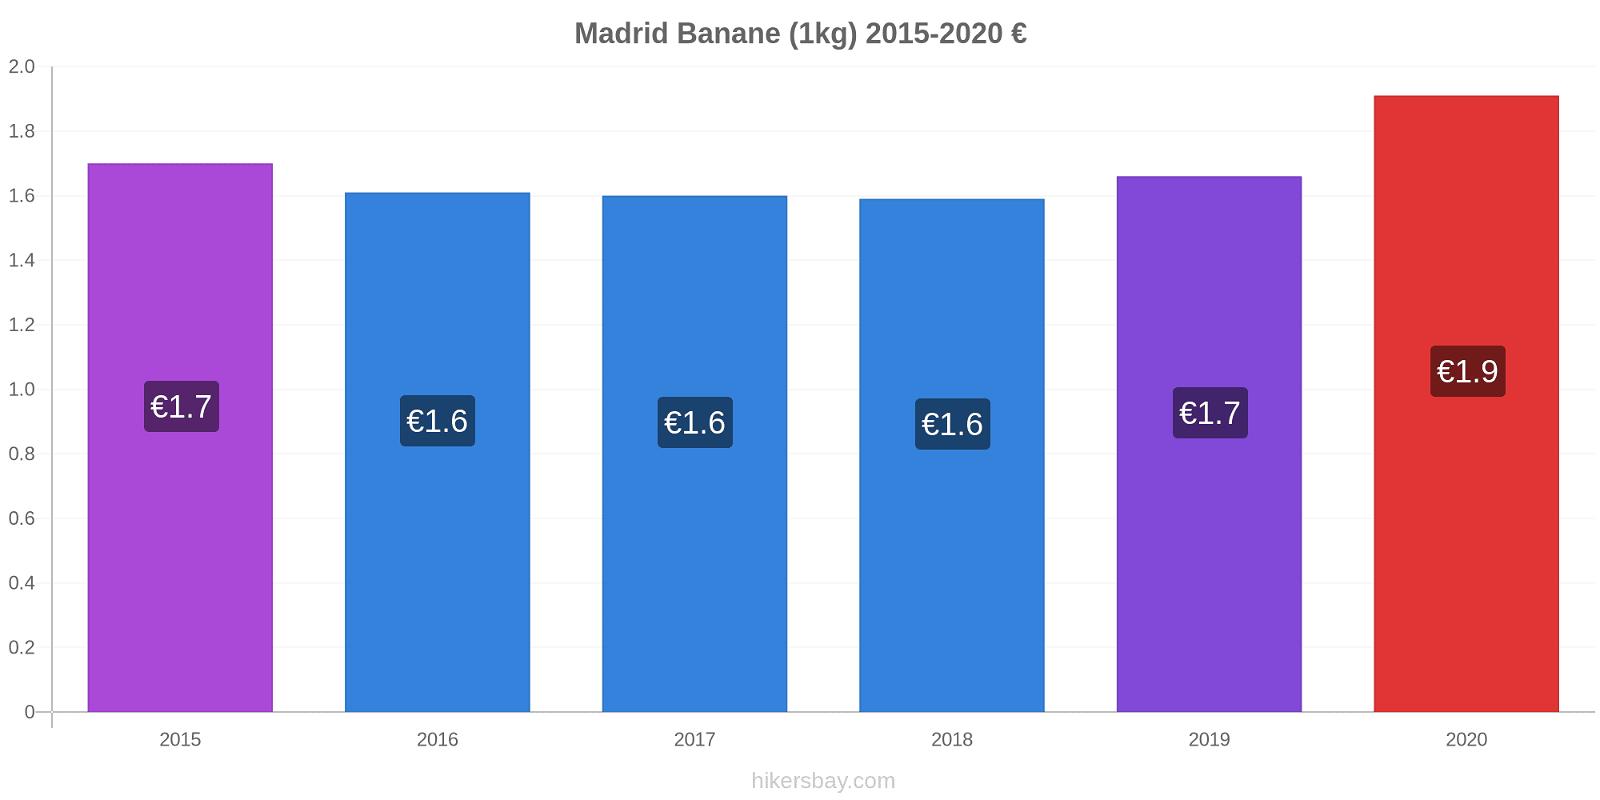 Madrid variazioni di prezzo Banana (1kg) hikersbay.com